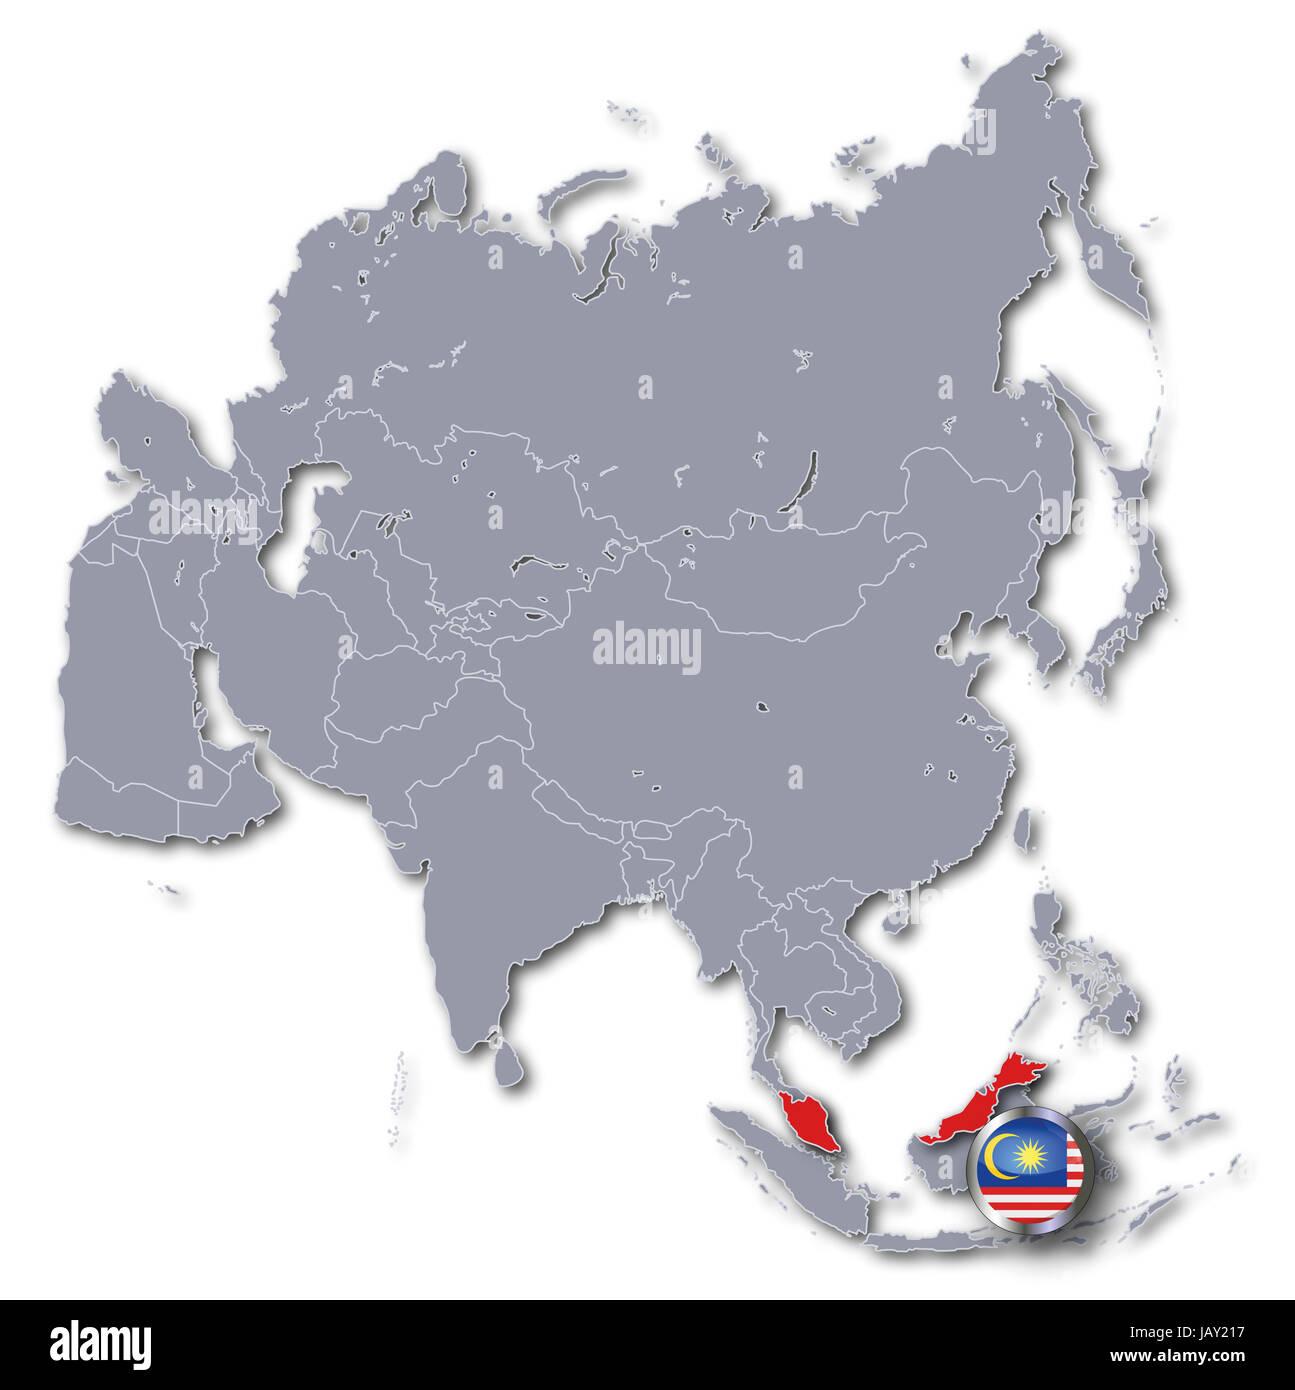 Map Of Asia Malaysia.Asia Map With Malaysia Stock Photo 144423811 Alamy